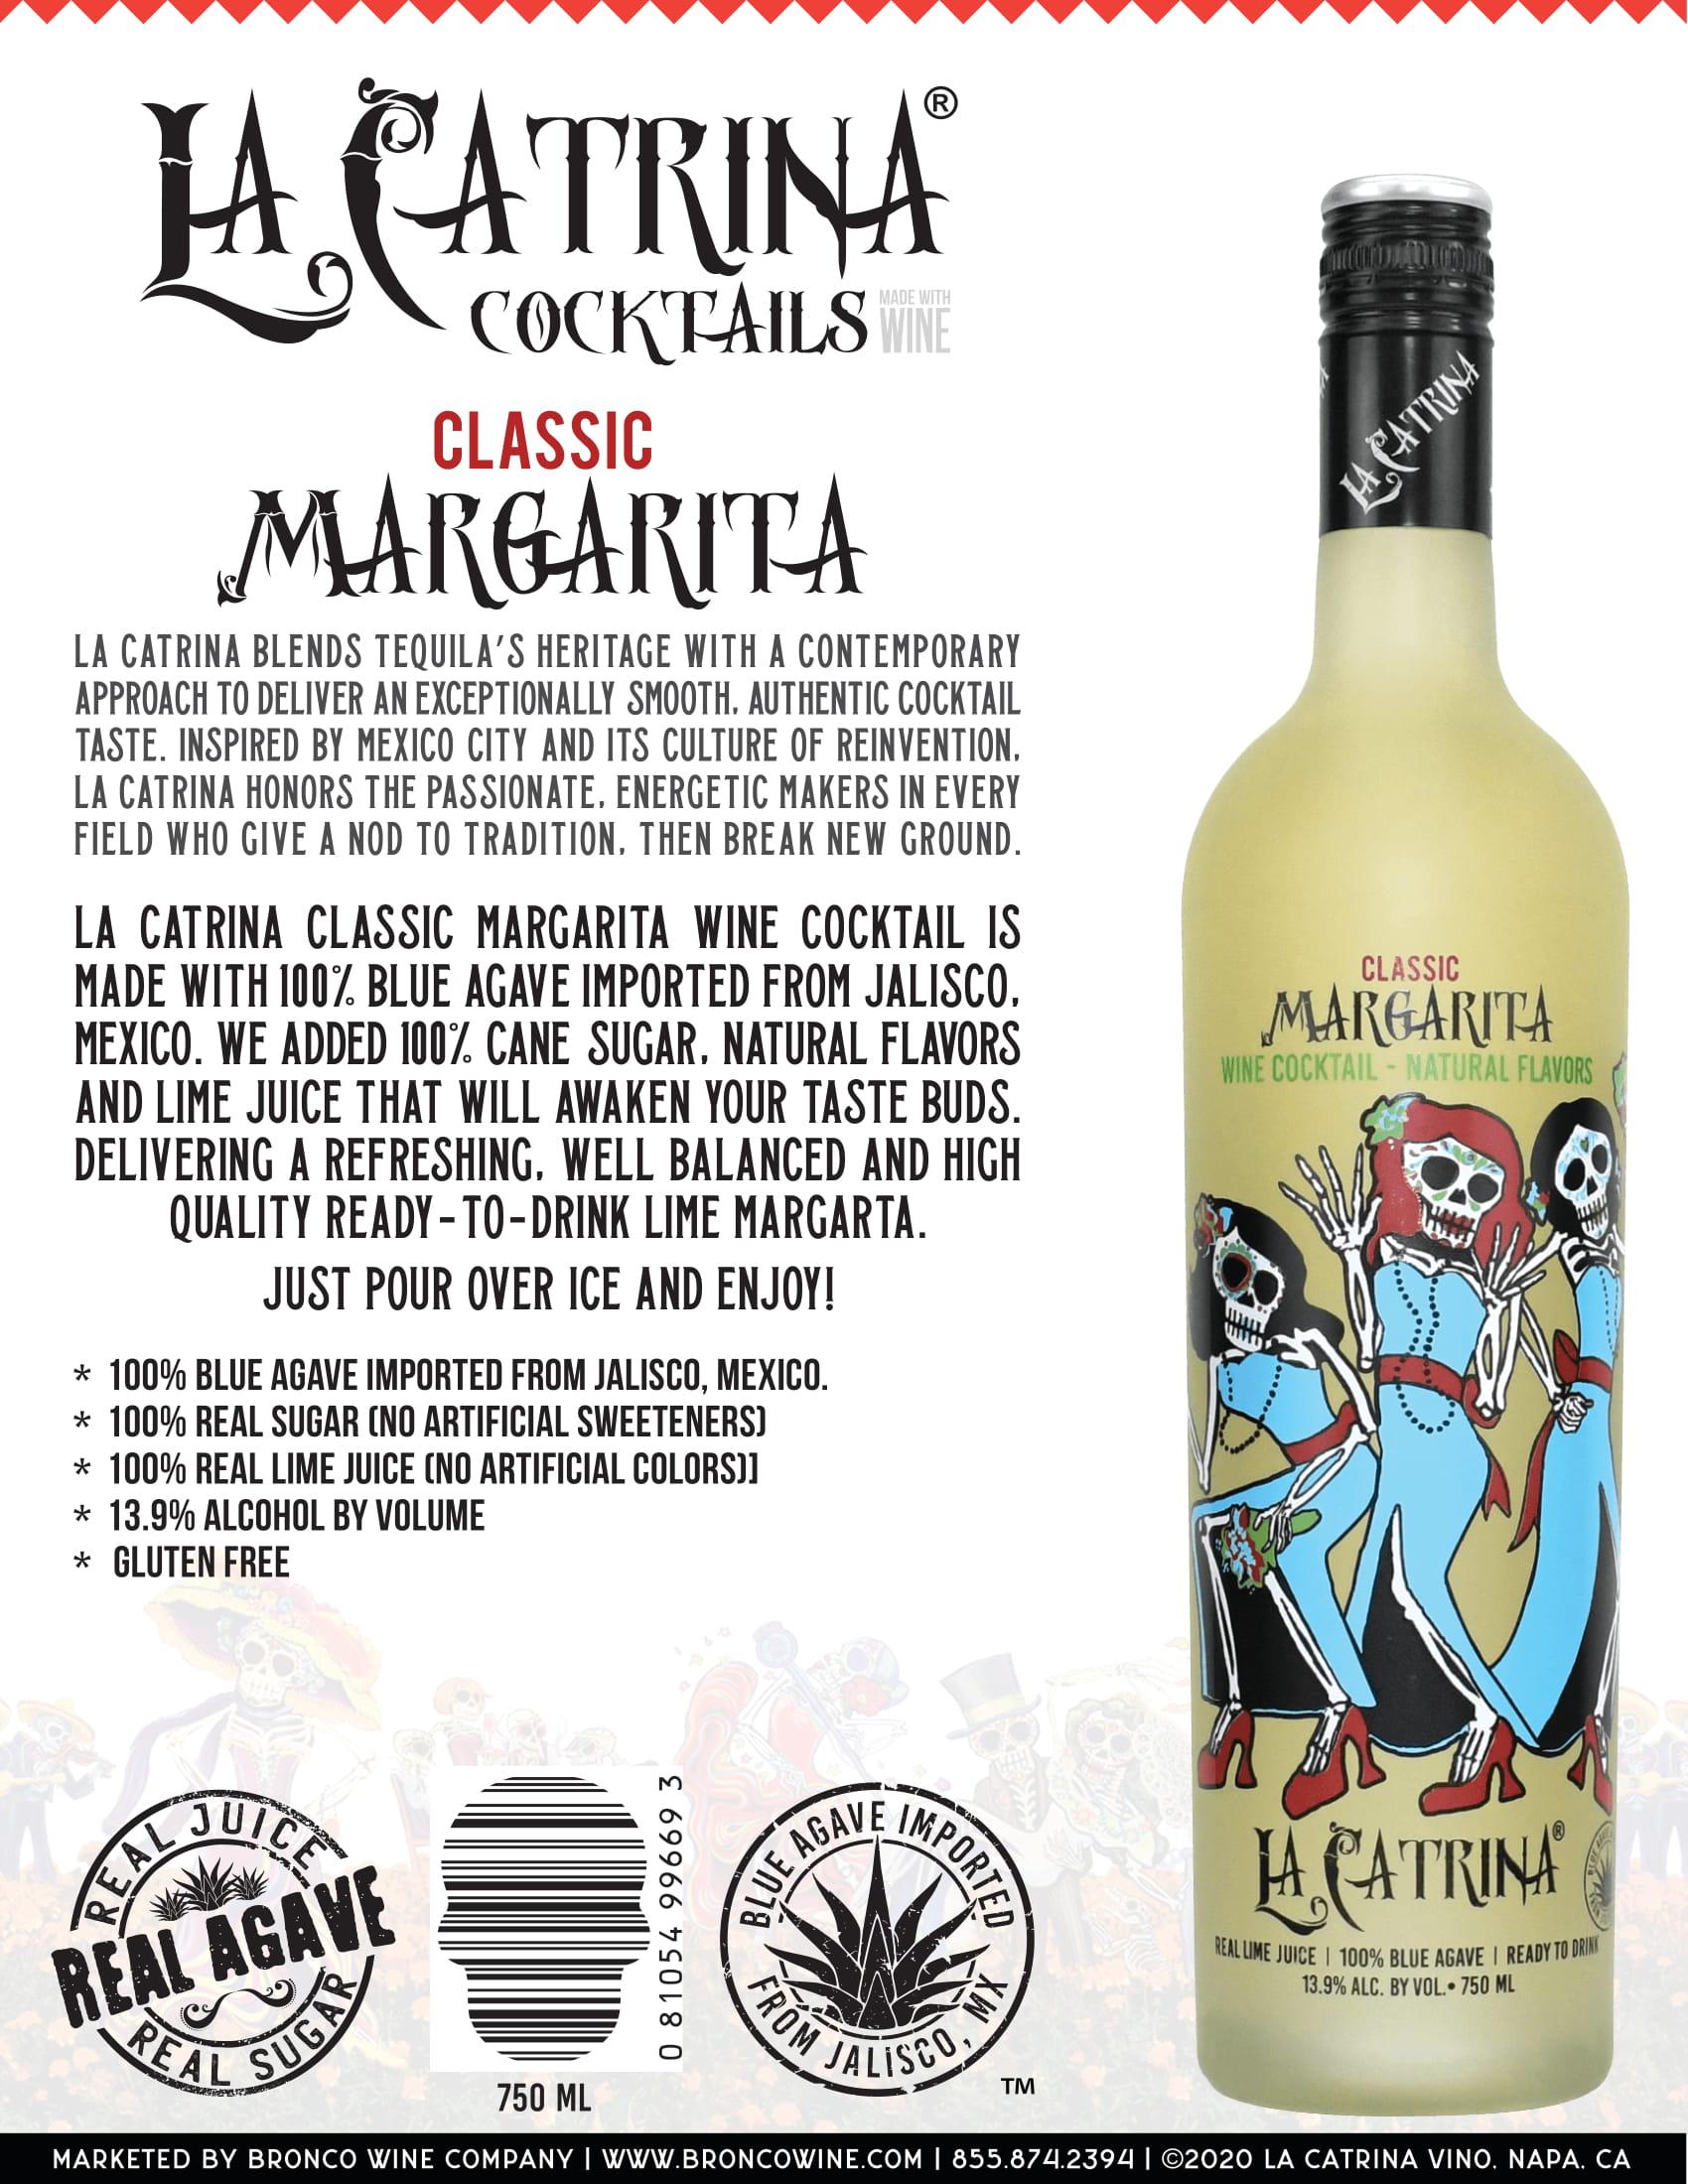 La Catrina Cocktails Classic Margarita Tech Sheet